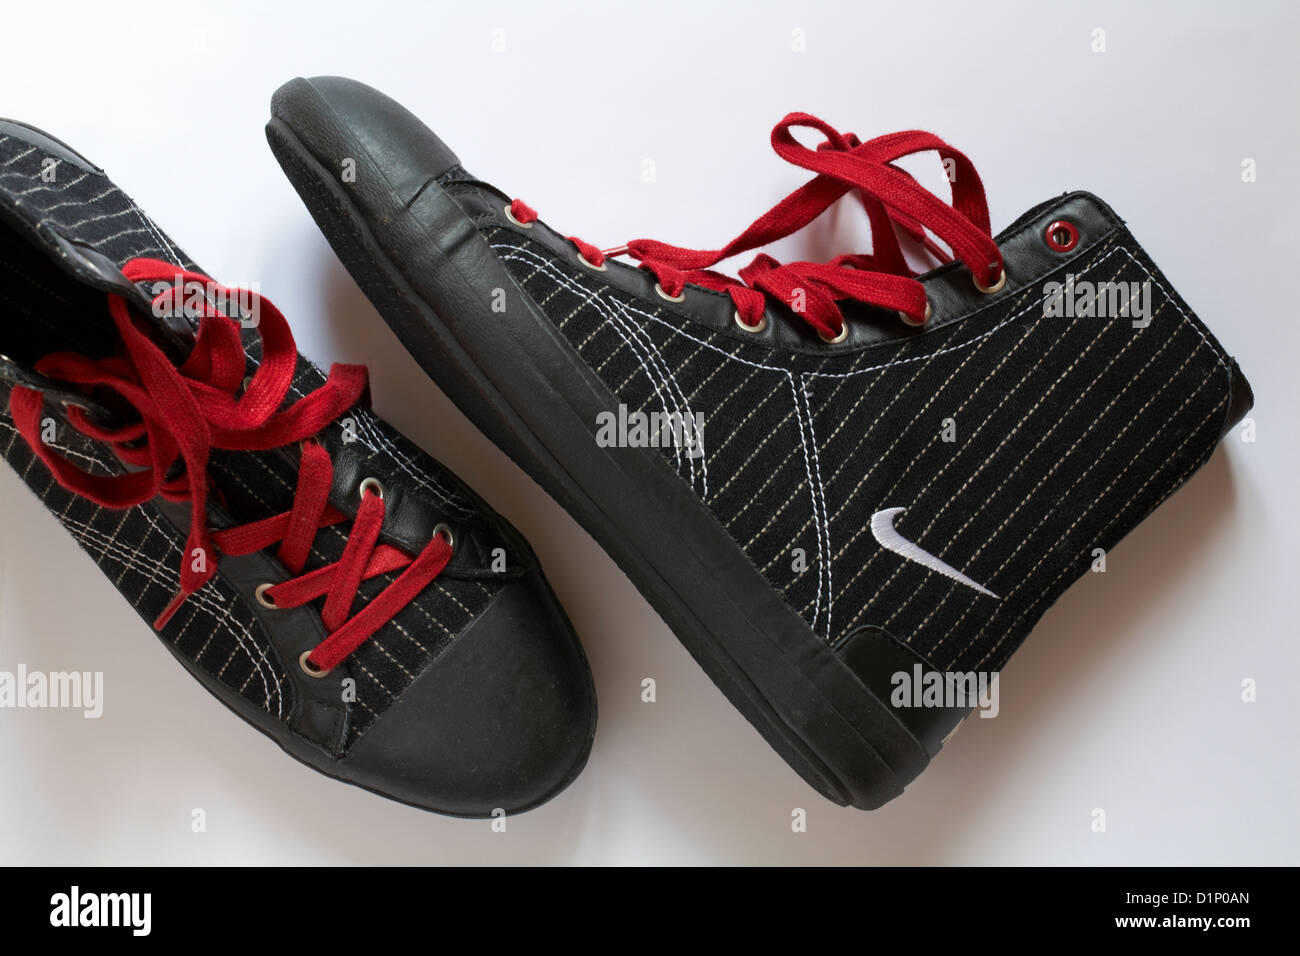 Black Nike Shoes Stockfotos & Black Nike Shoes Bilder Alamy